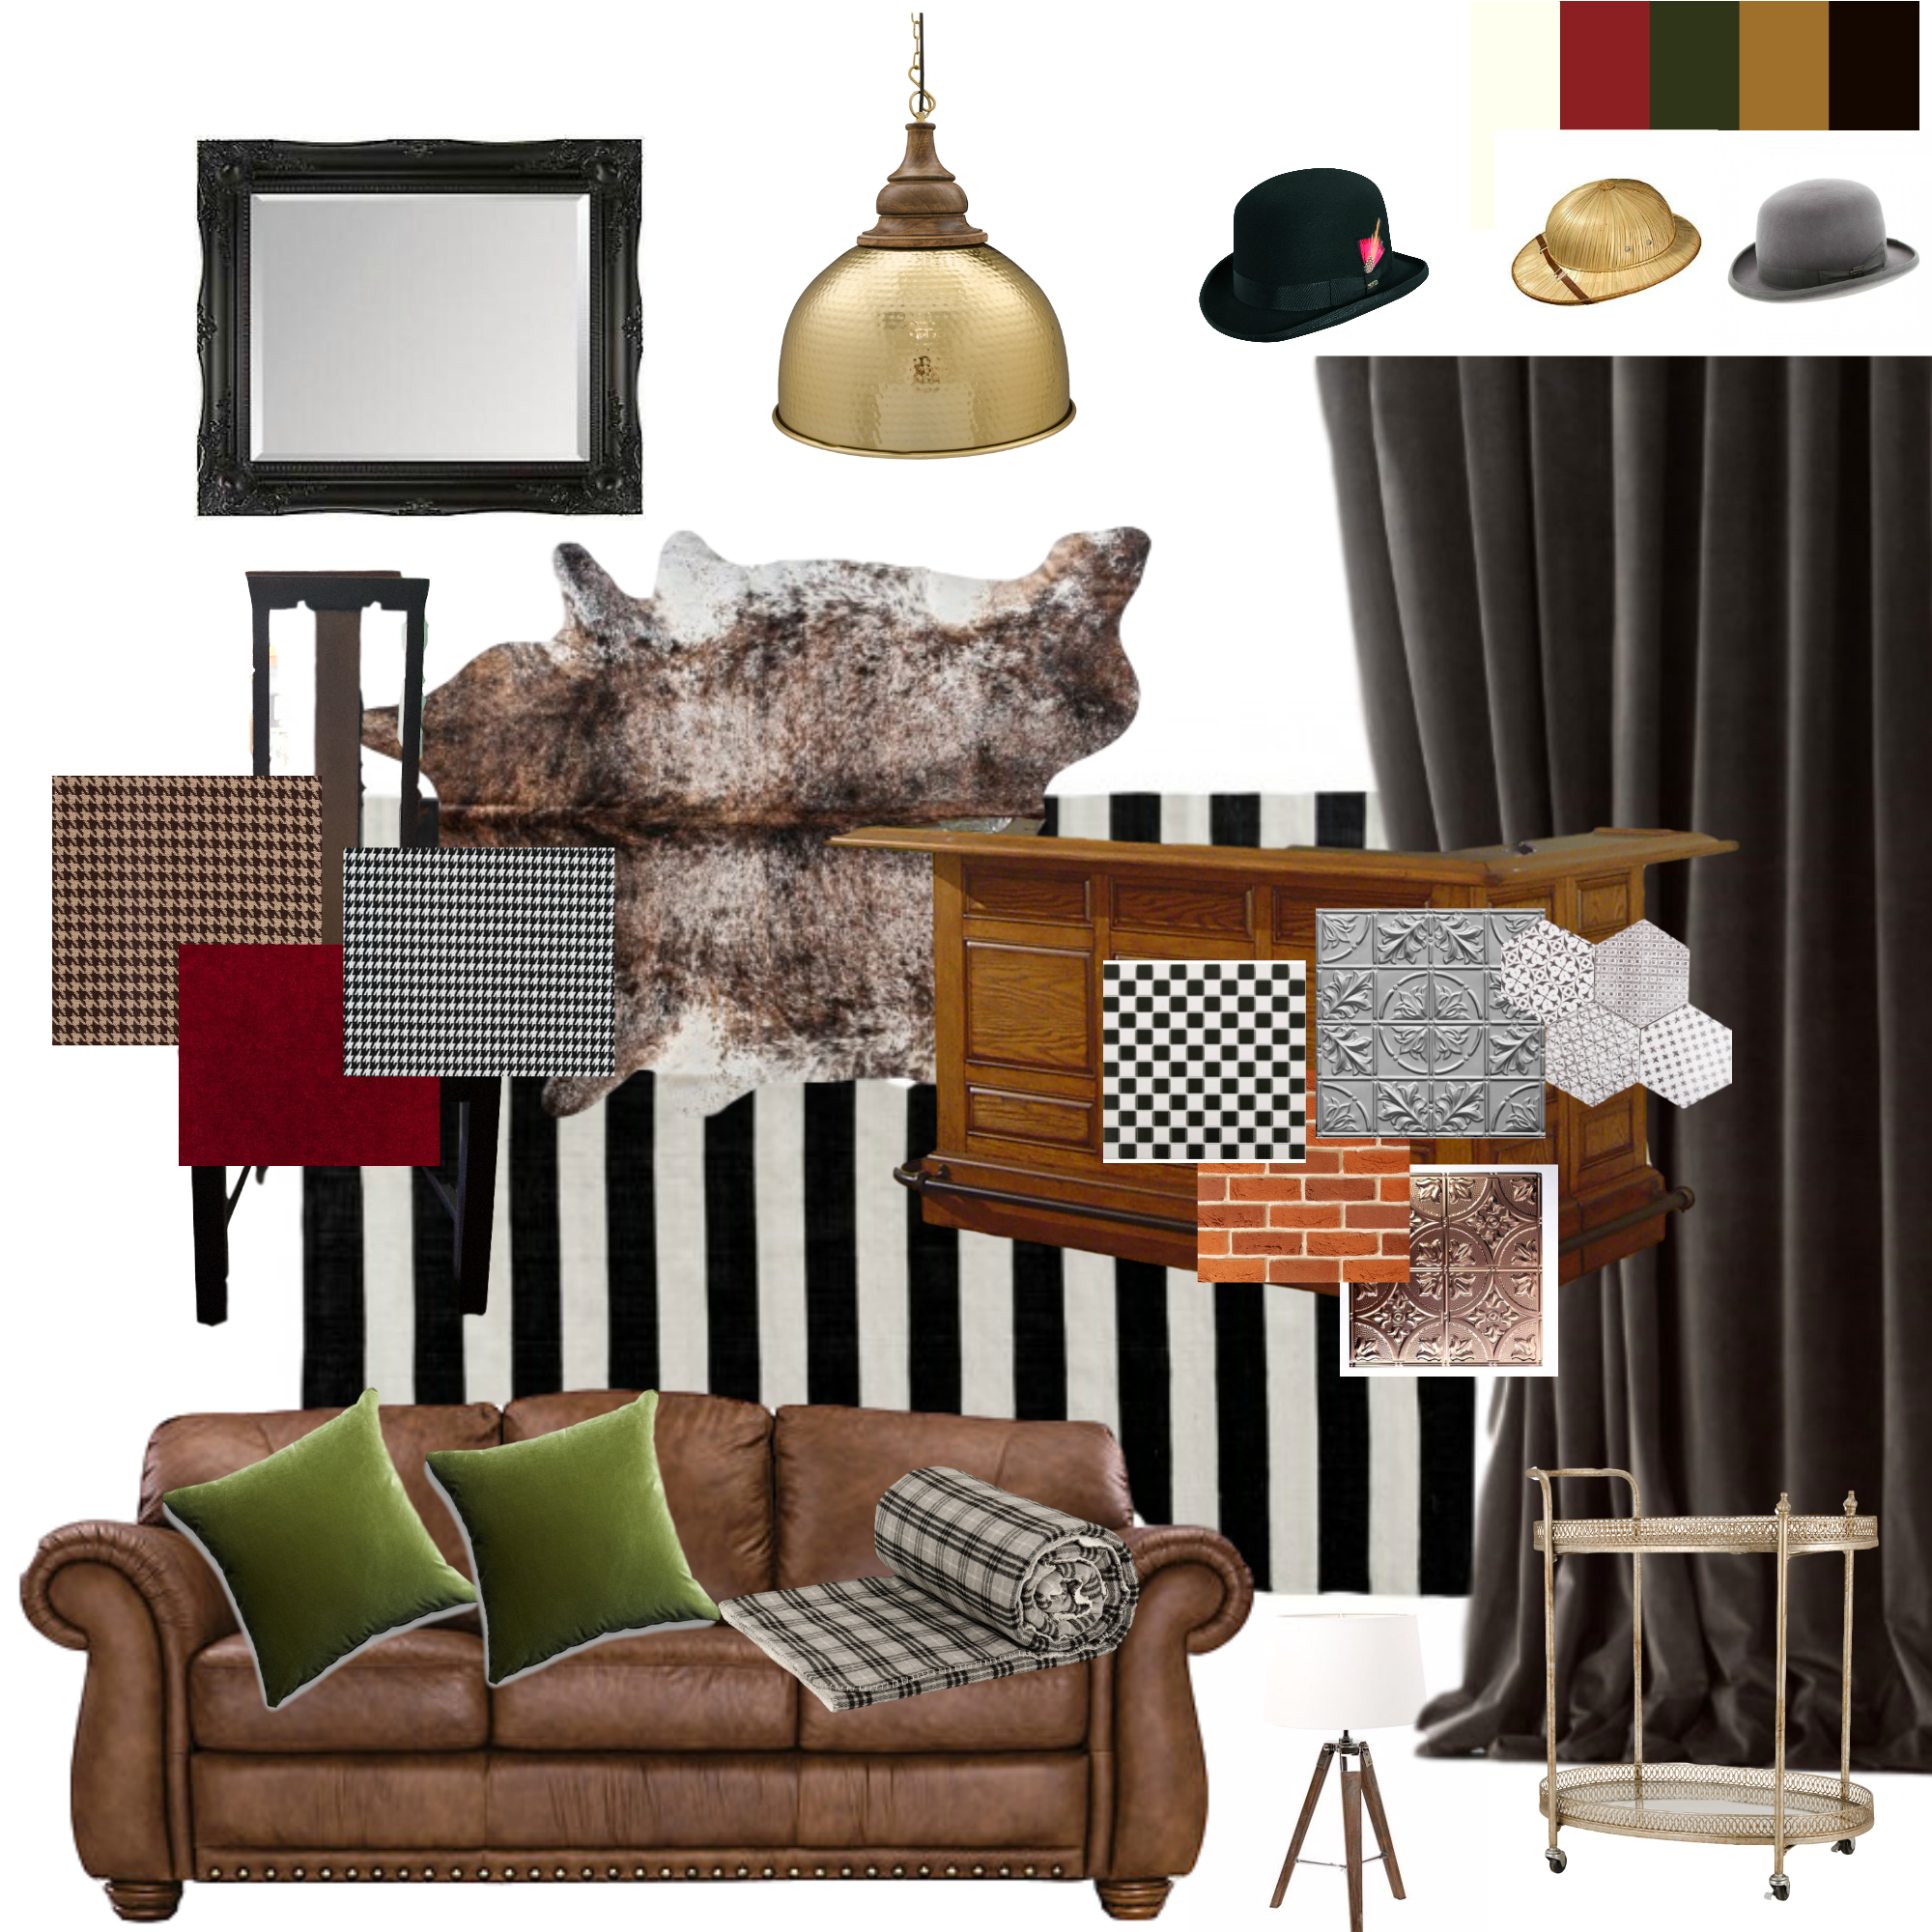 Gentleman s club cigar lounge mood board ideas board decor